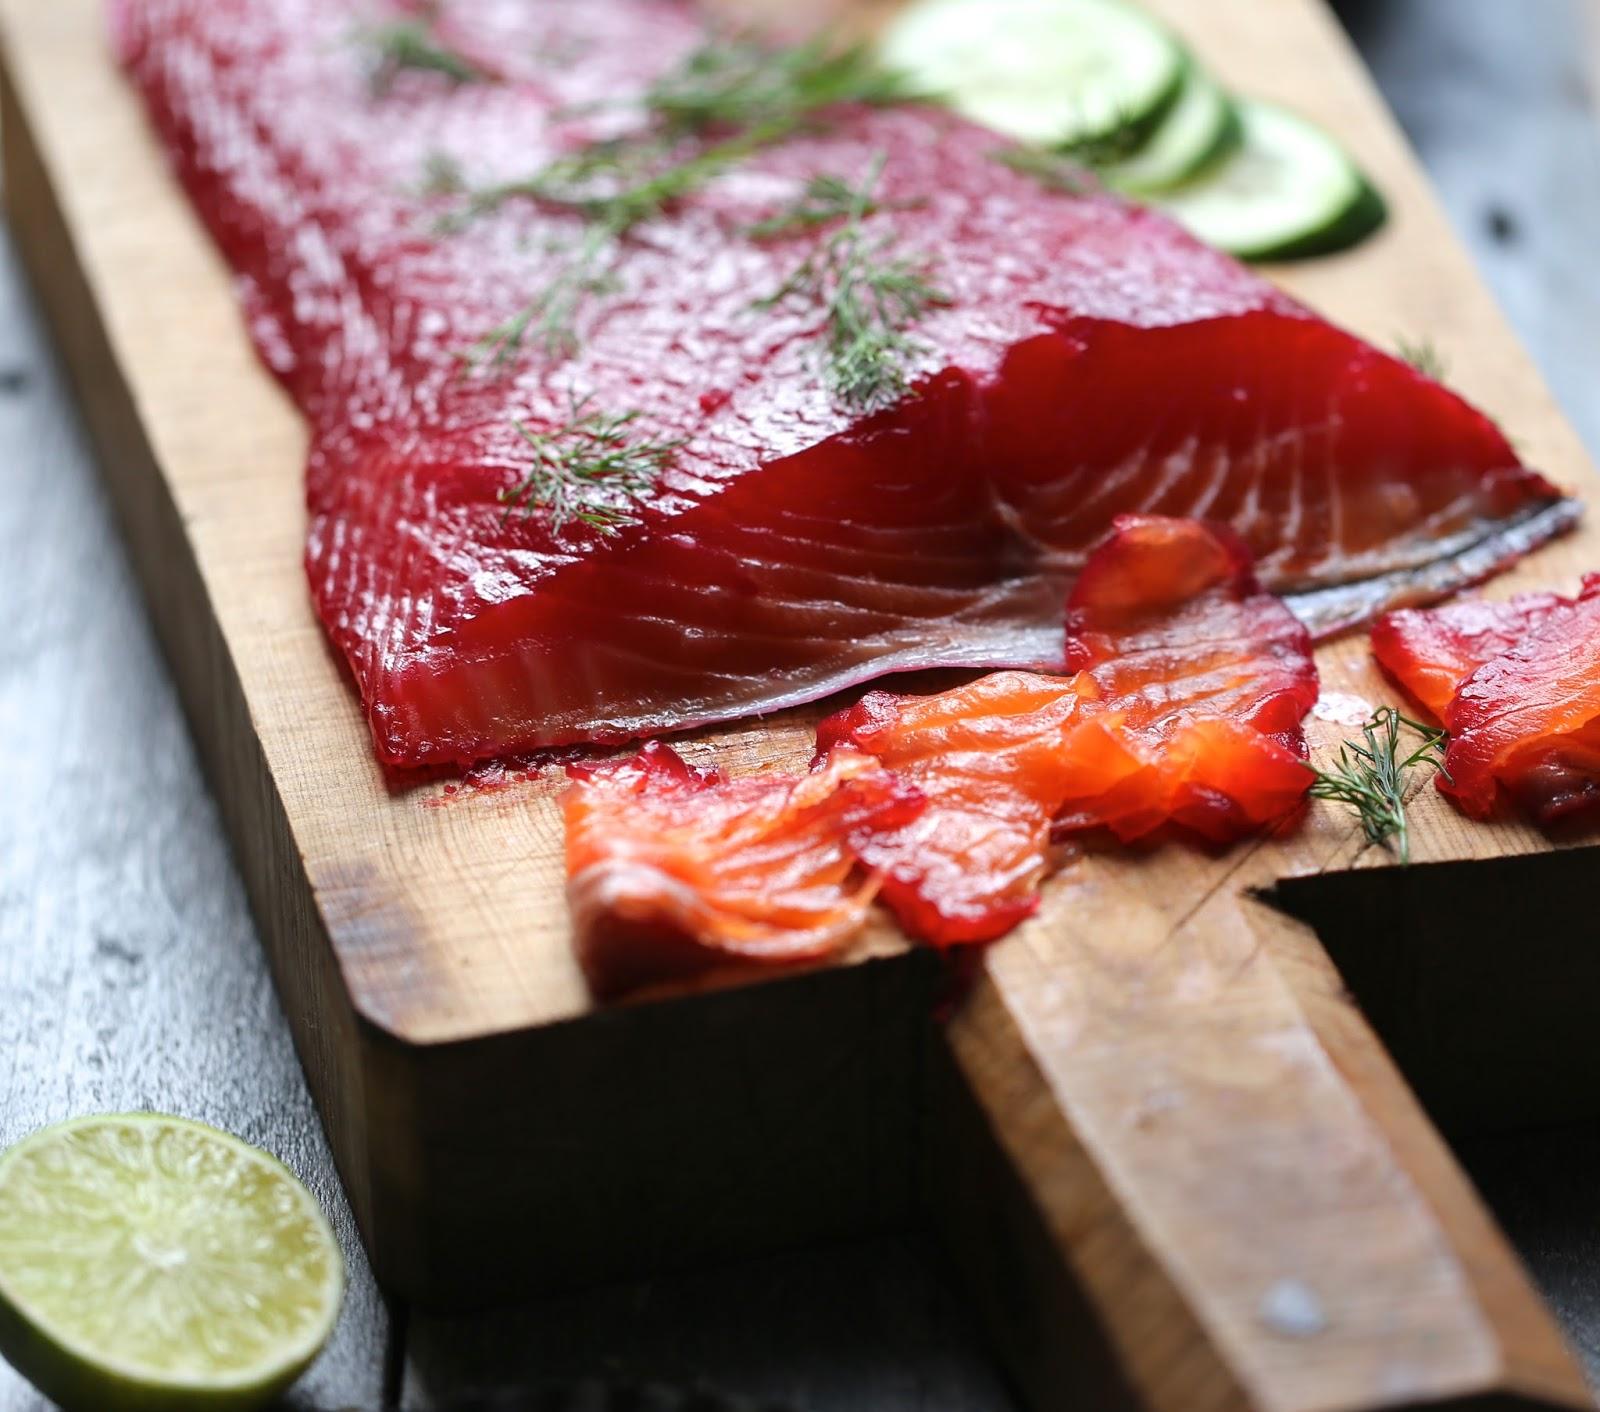 on dine chez nanou saumon marin fa on gravadlax la vodka et betterave rouge. Black Bedroom Furniture Sets. Home Design Ideas